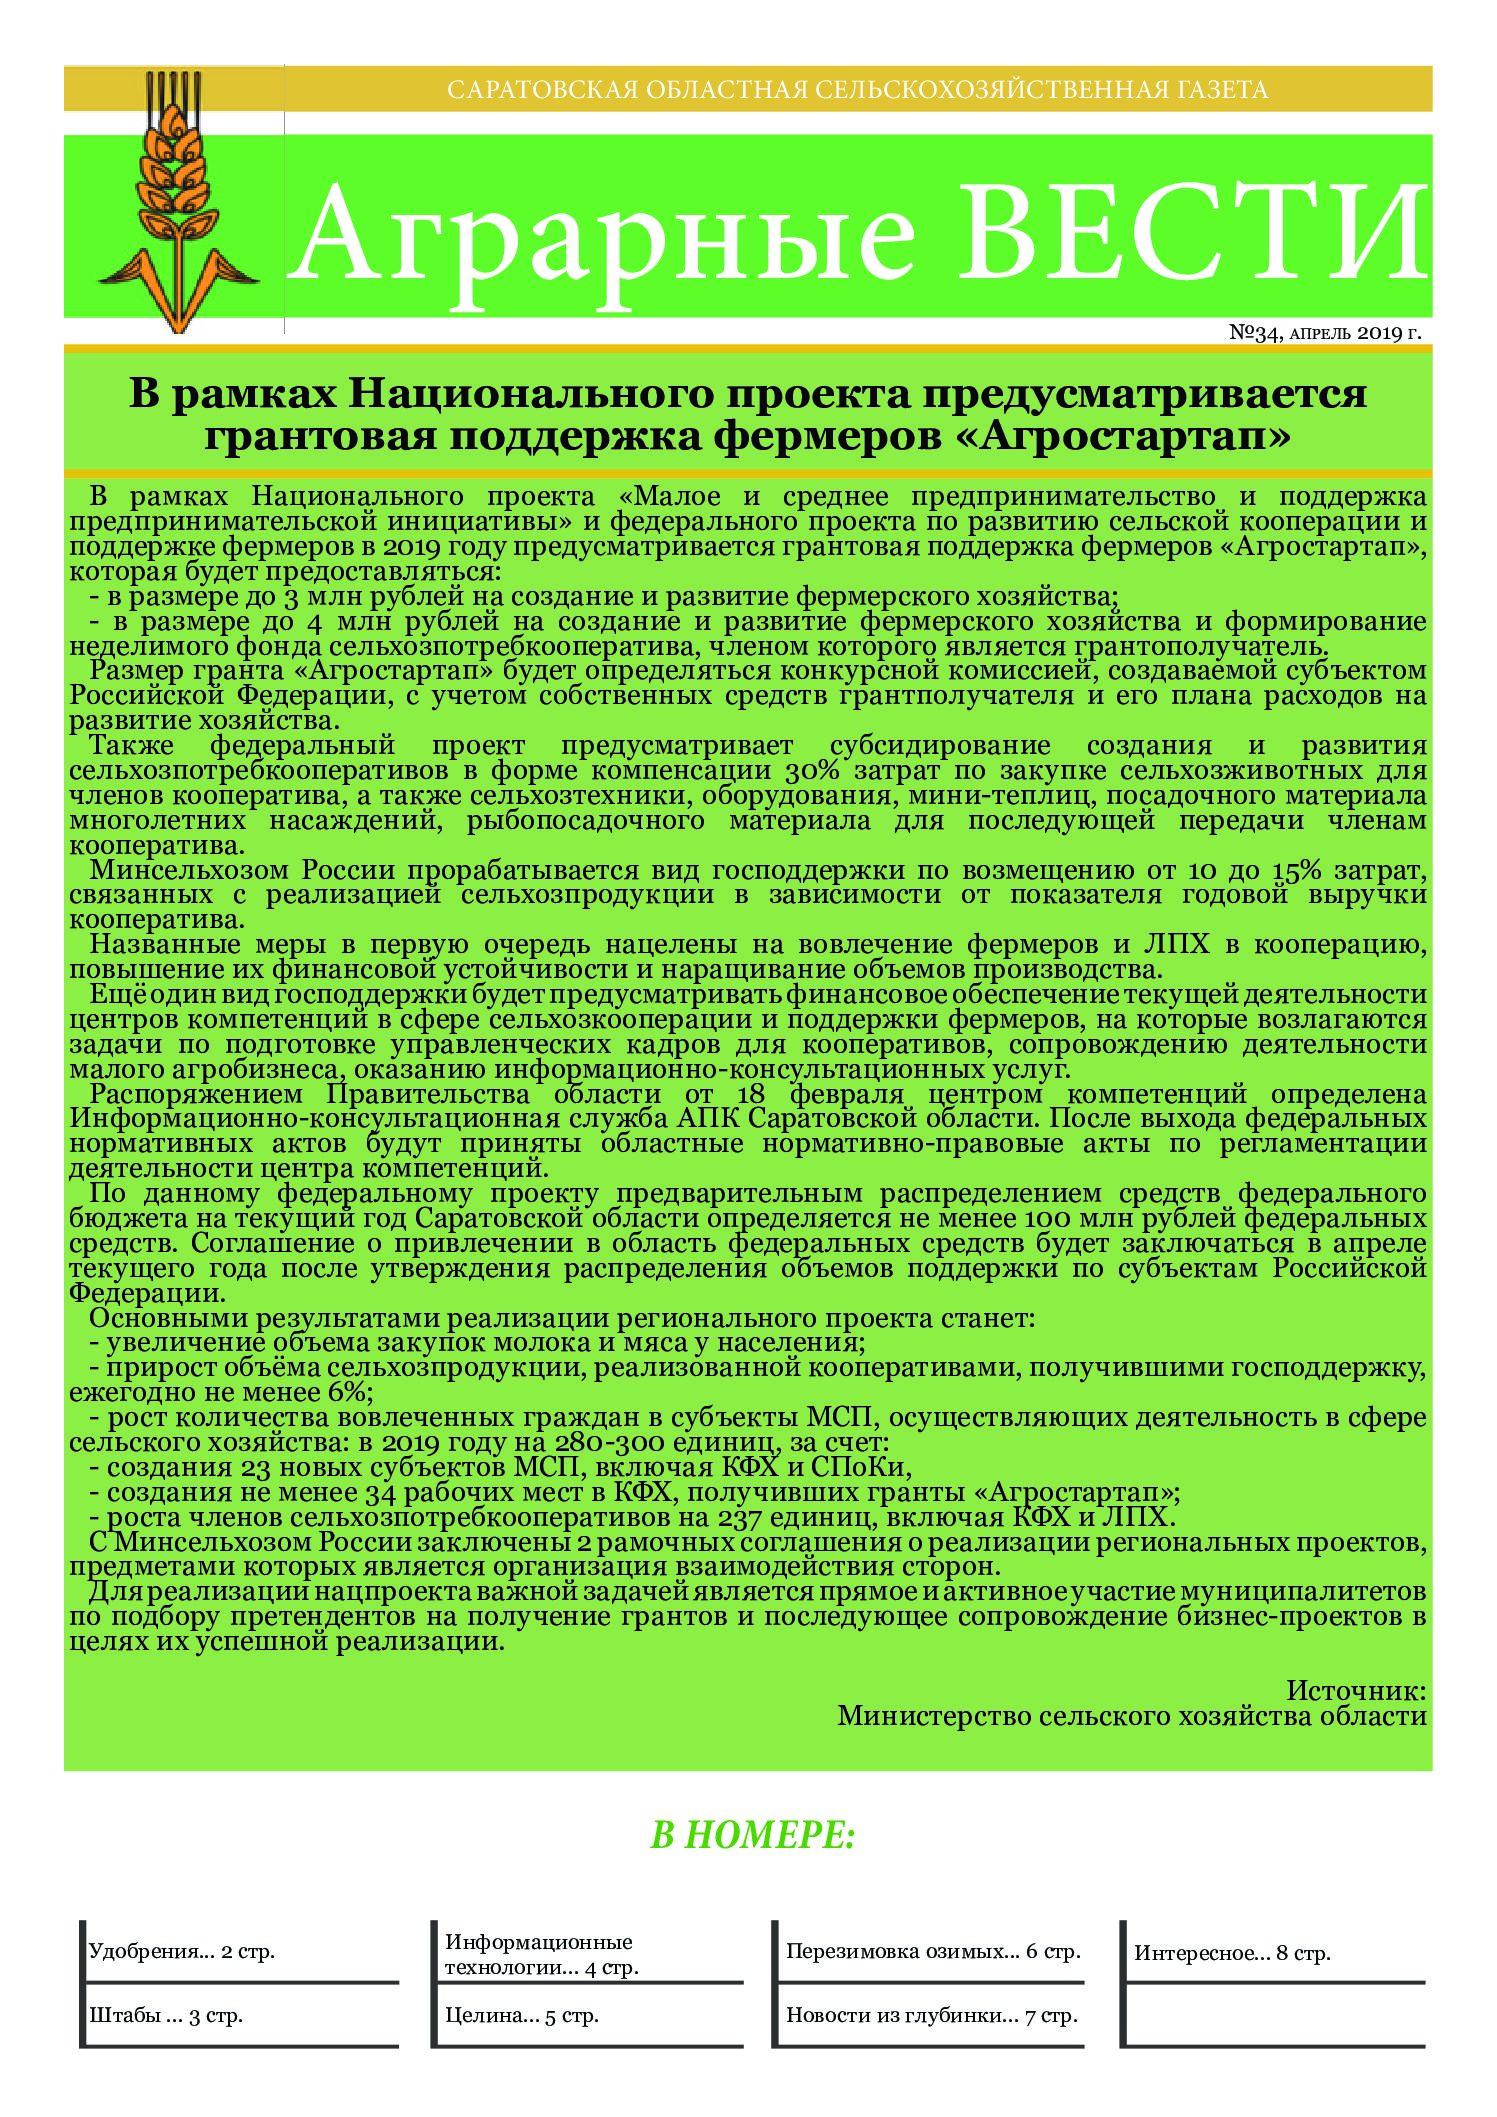 https://saratovagro.ru/wp-content/uploads/2020/08/34.2019-pdf.jpg